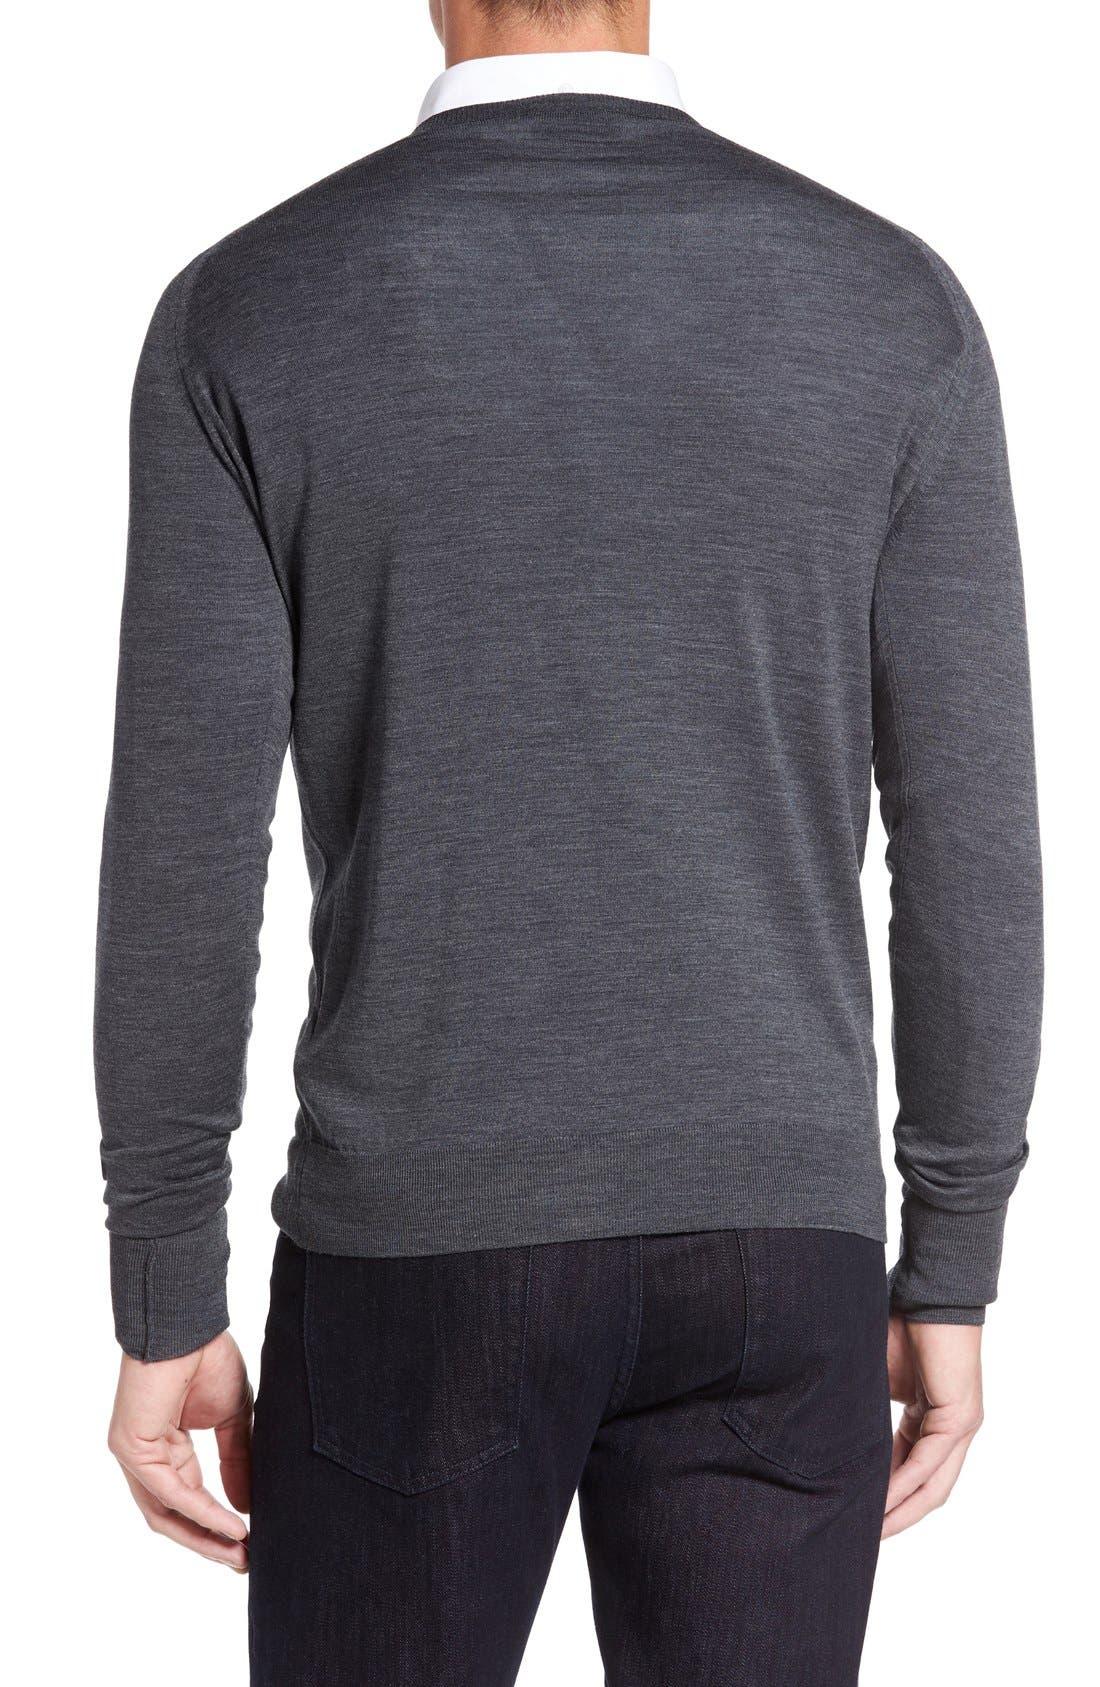 Alternate Image 2  - John Smedley 'Bobby' Easy Fit V Neck Wool Sweater